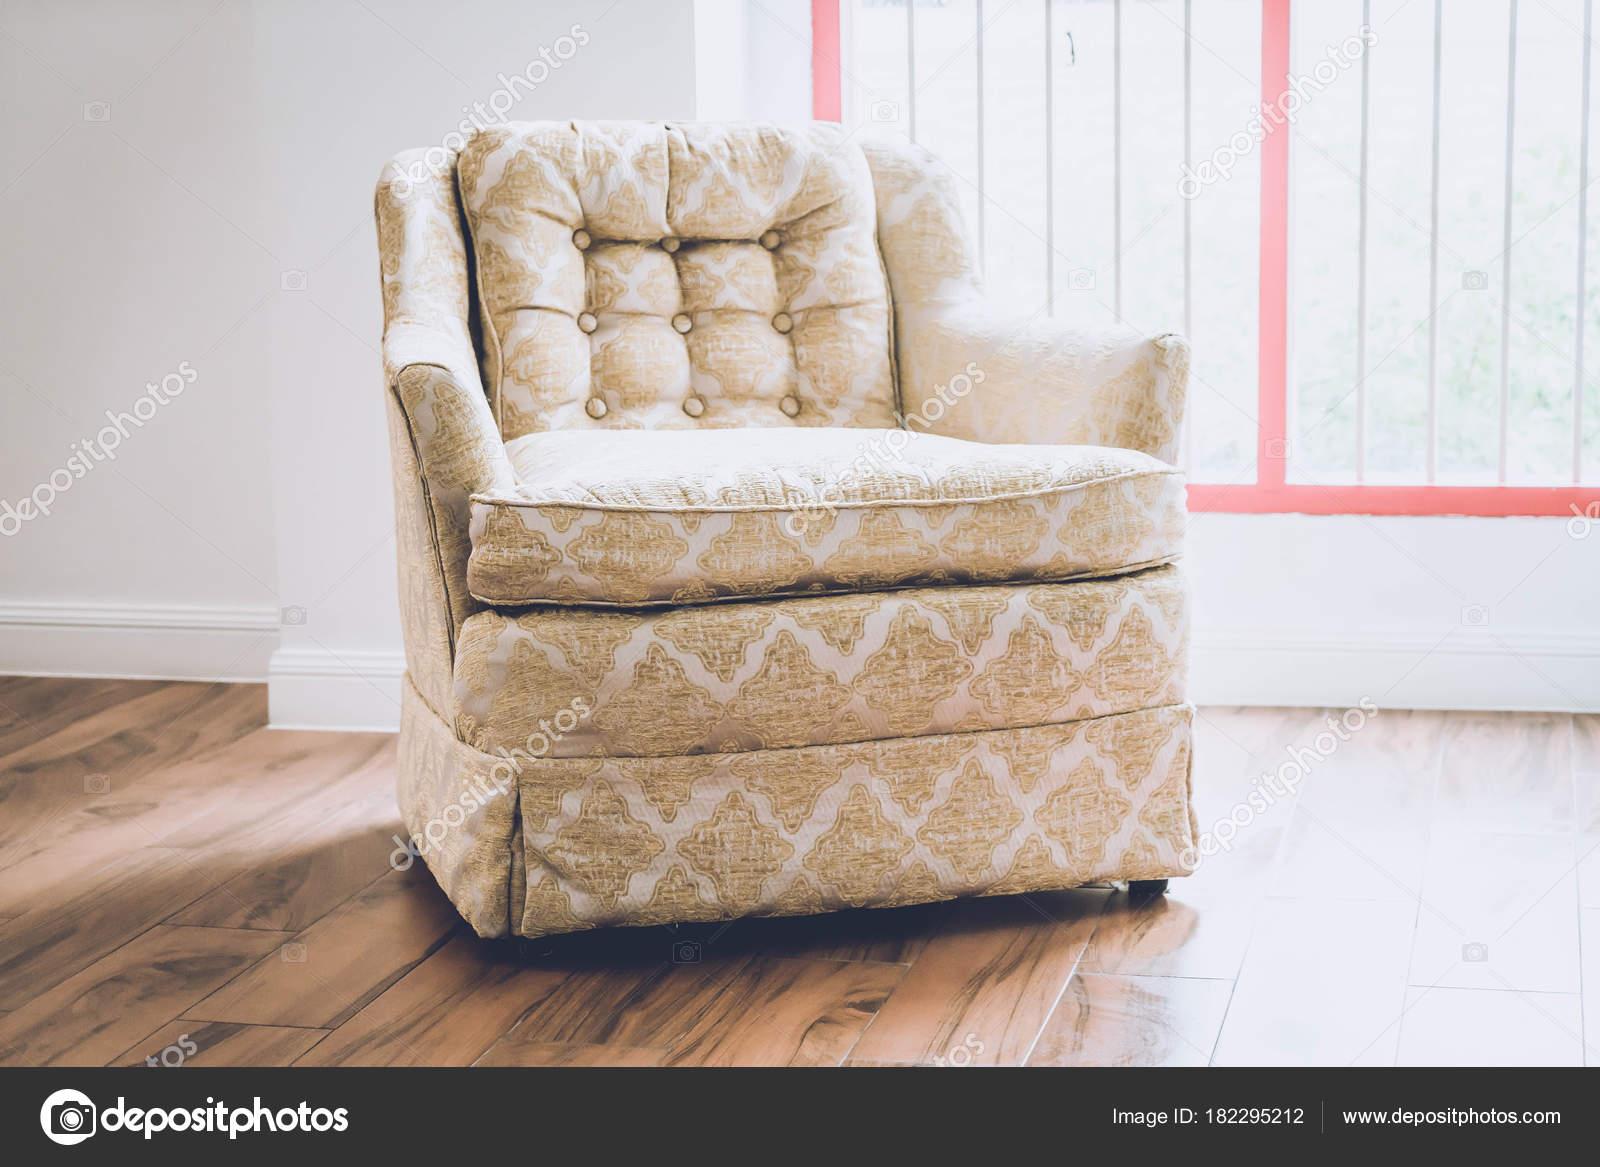 Oude fauteuil decoratie in huis u2014 stockfoto © topntp #182295212